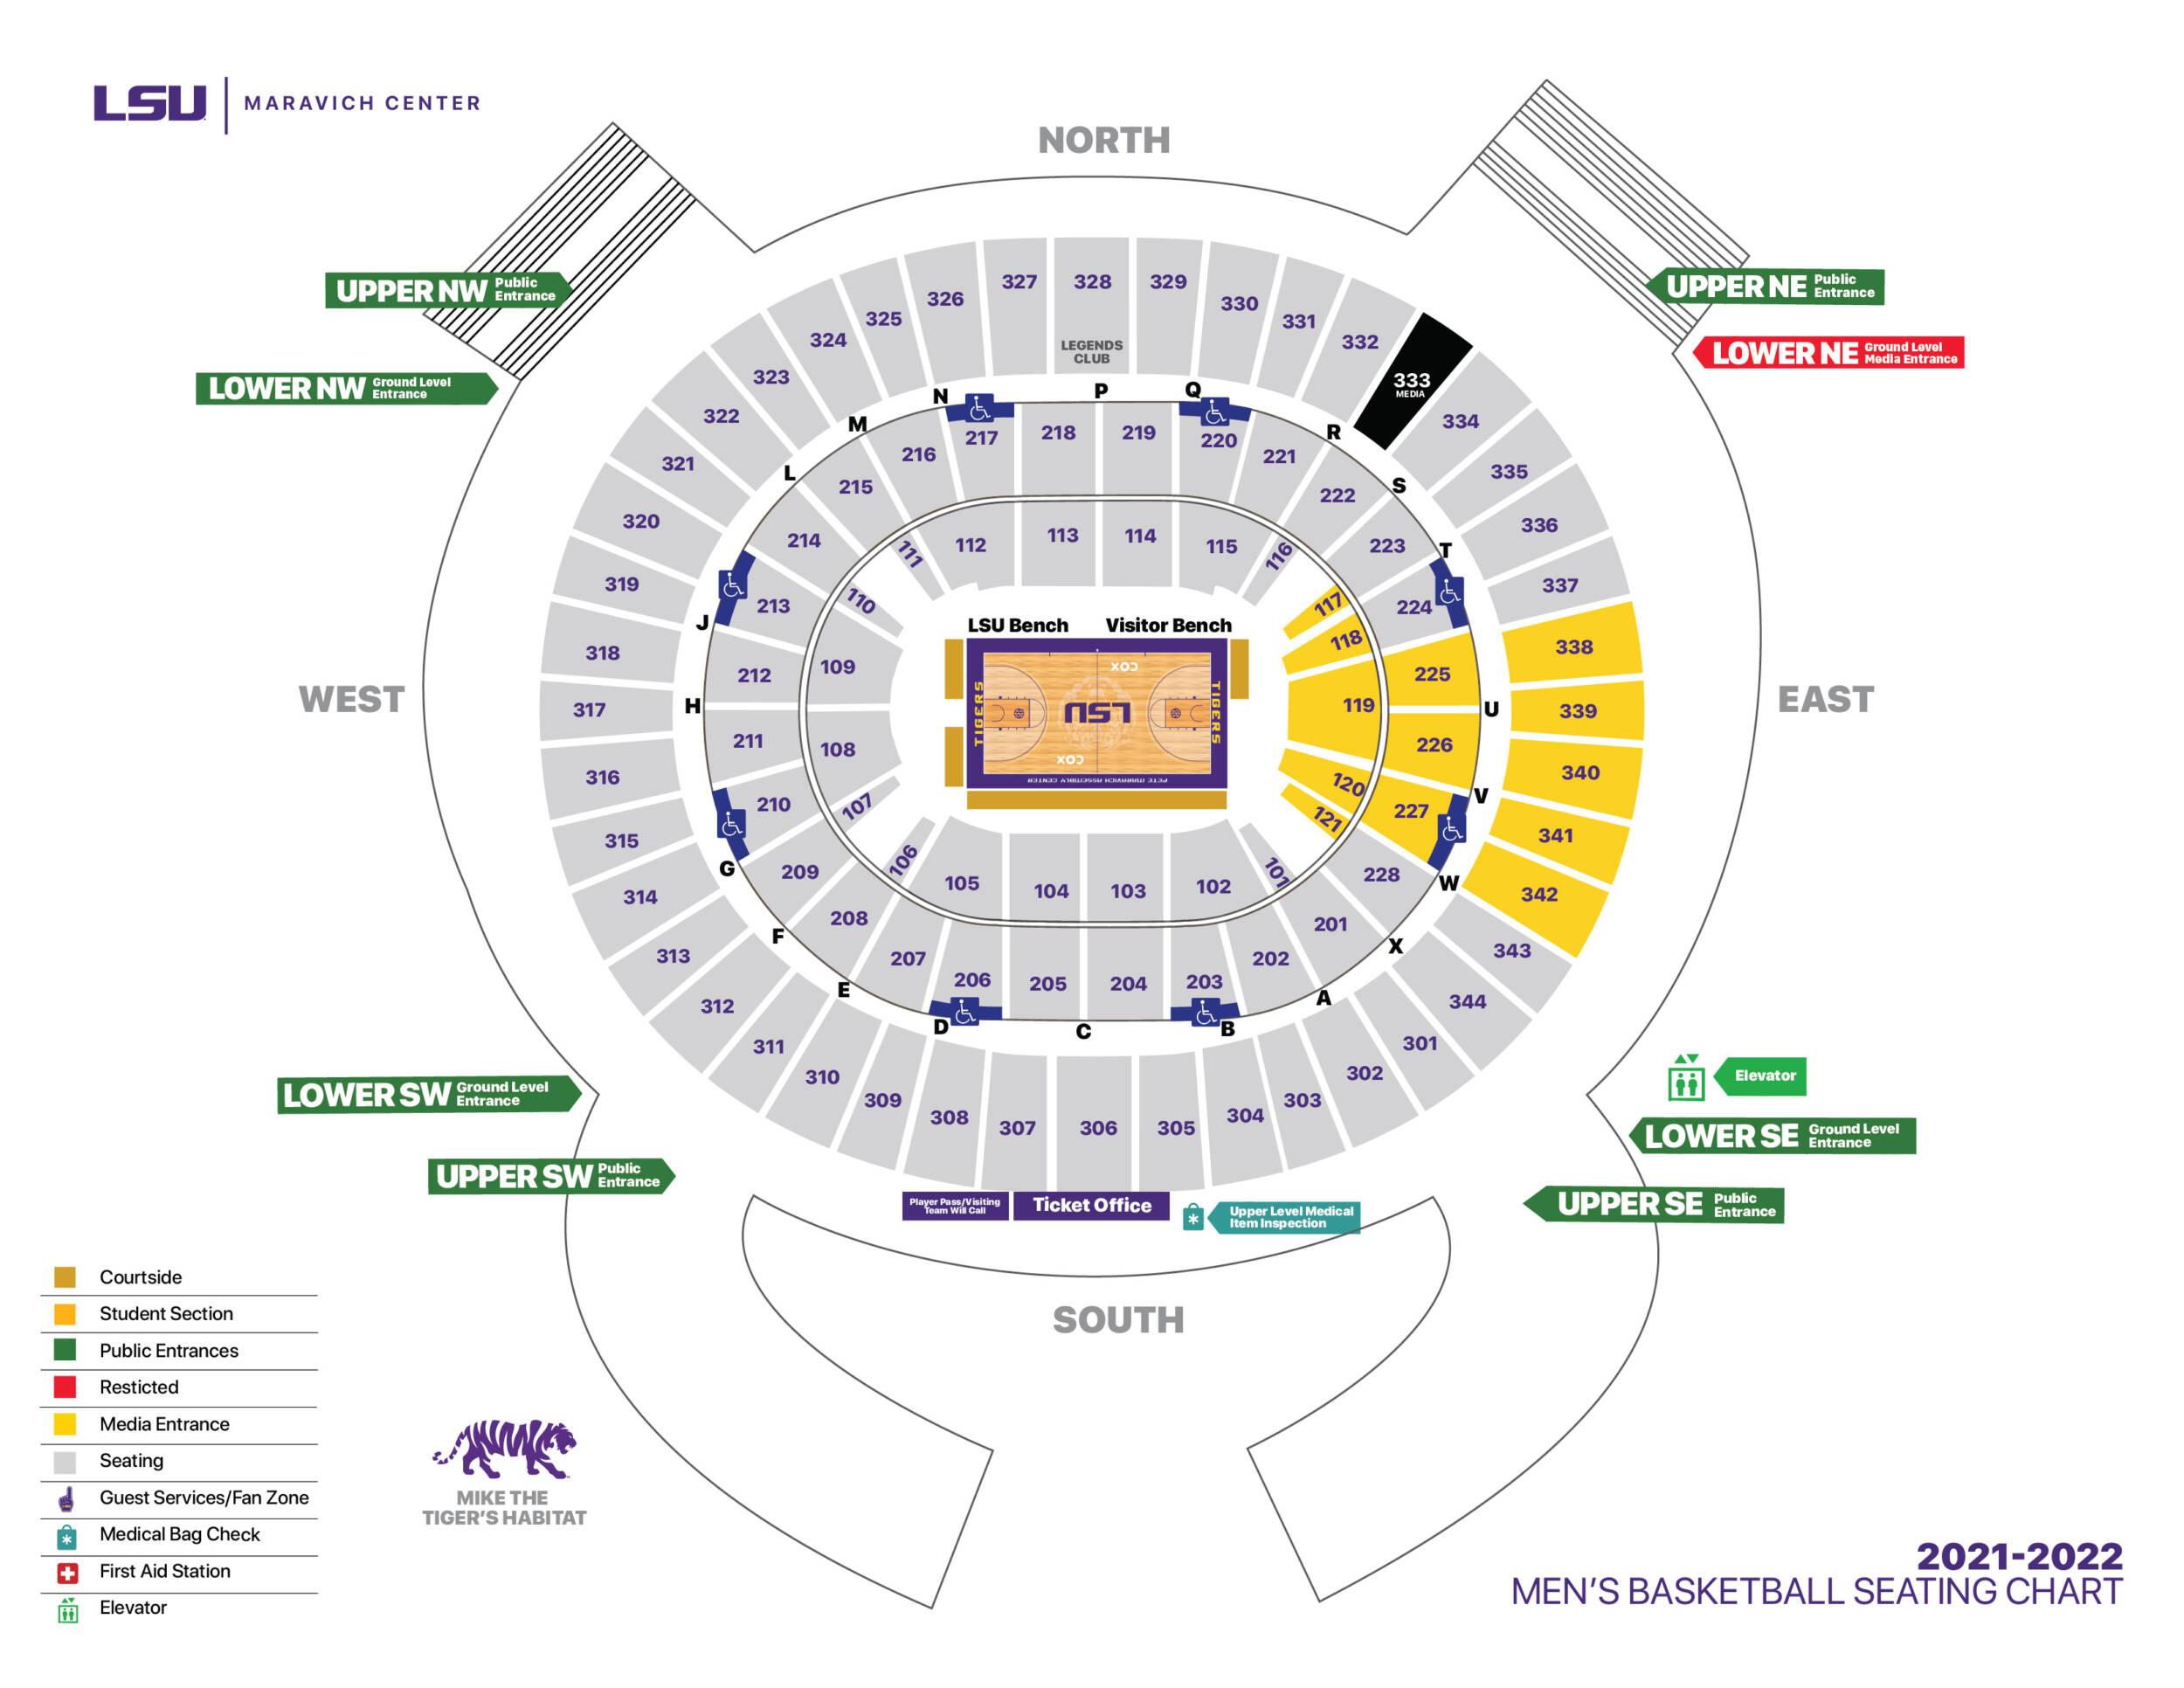 2021-22 LSU Men's Basketball - Maravich Center Seating Chart